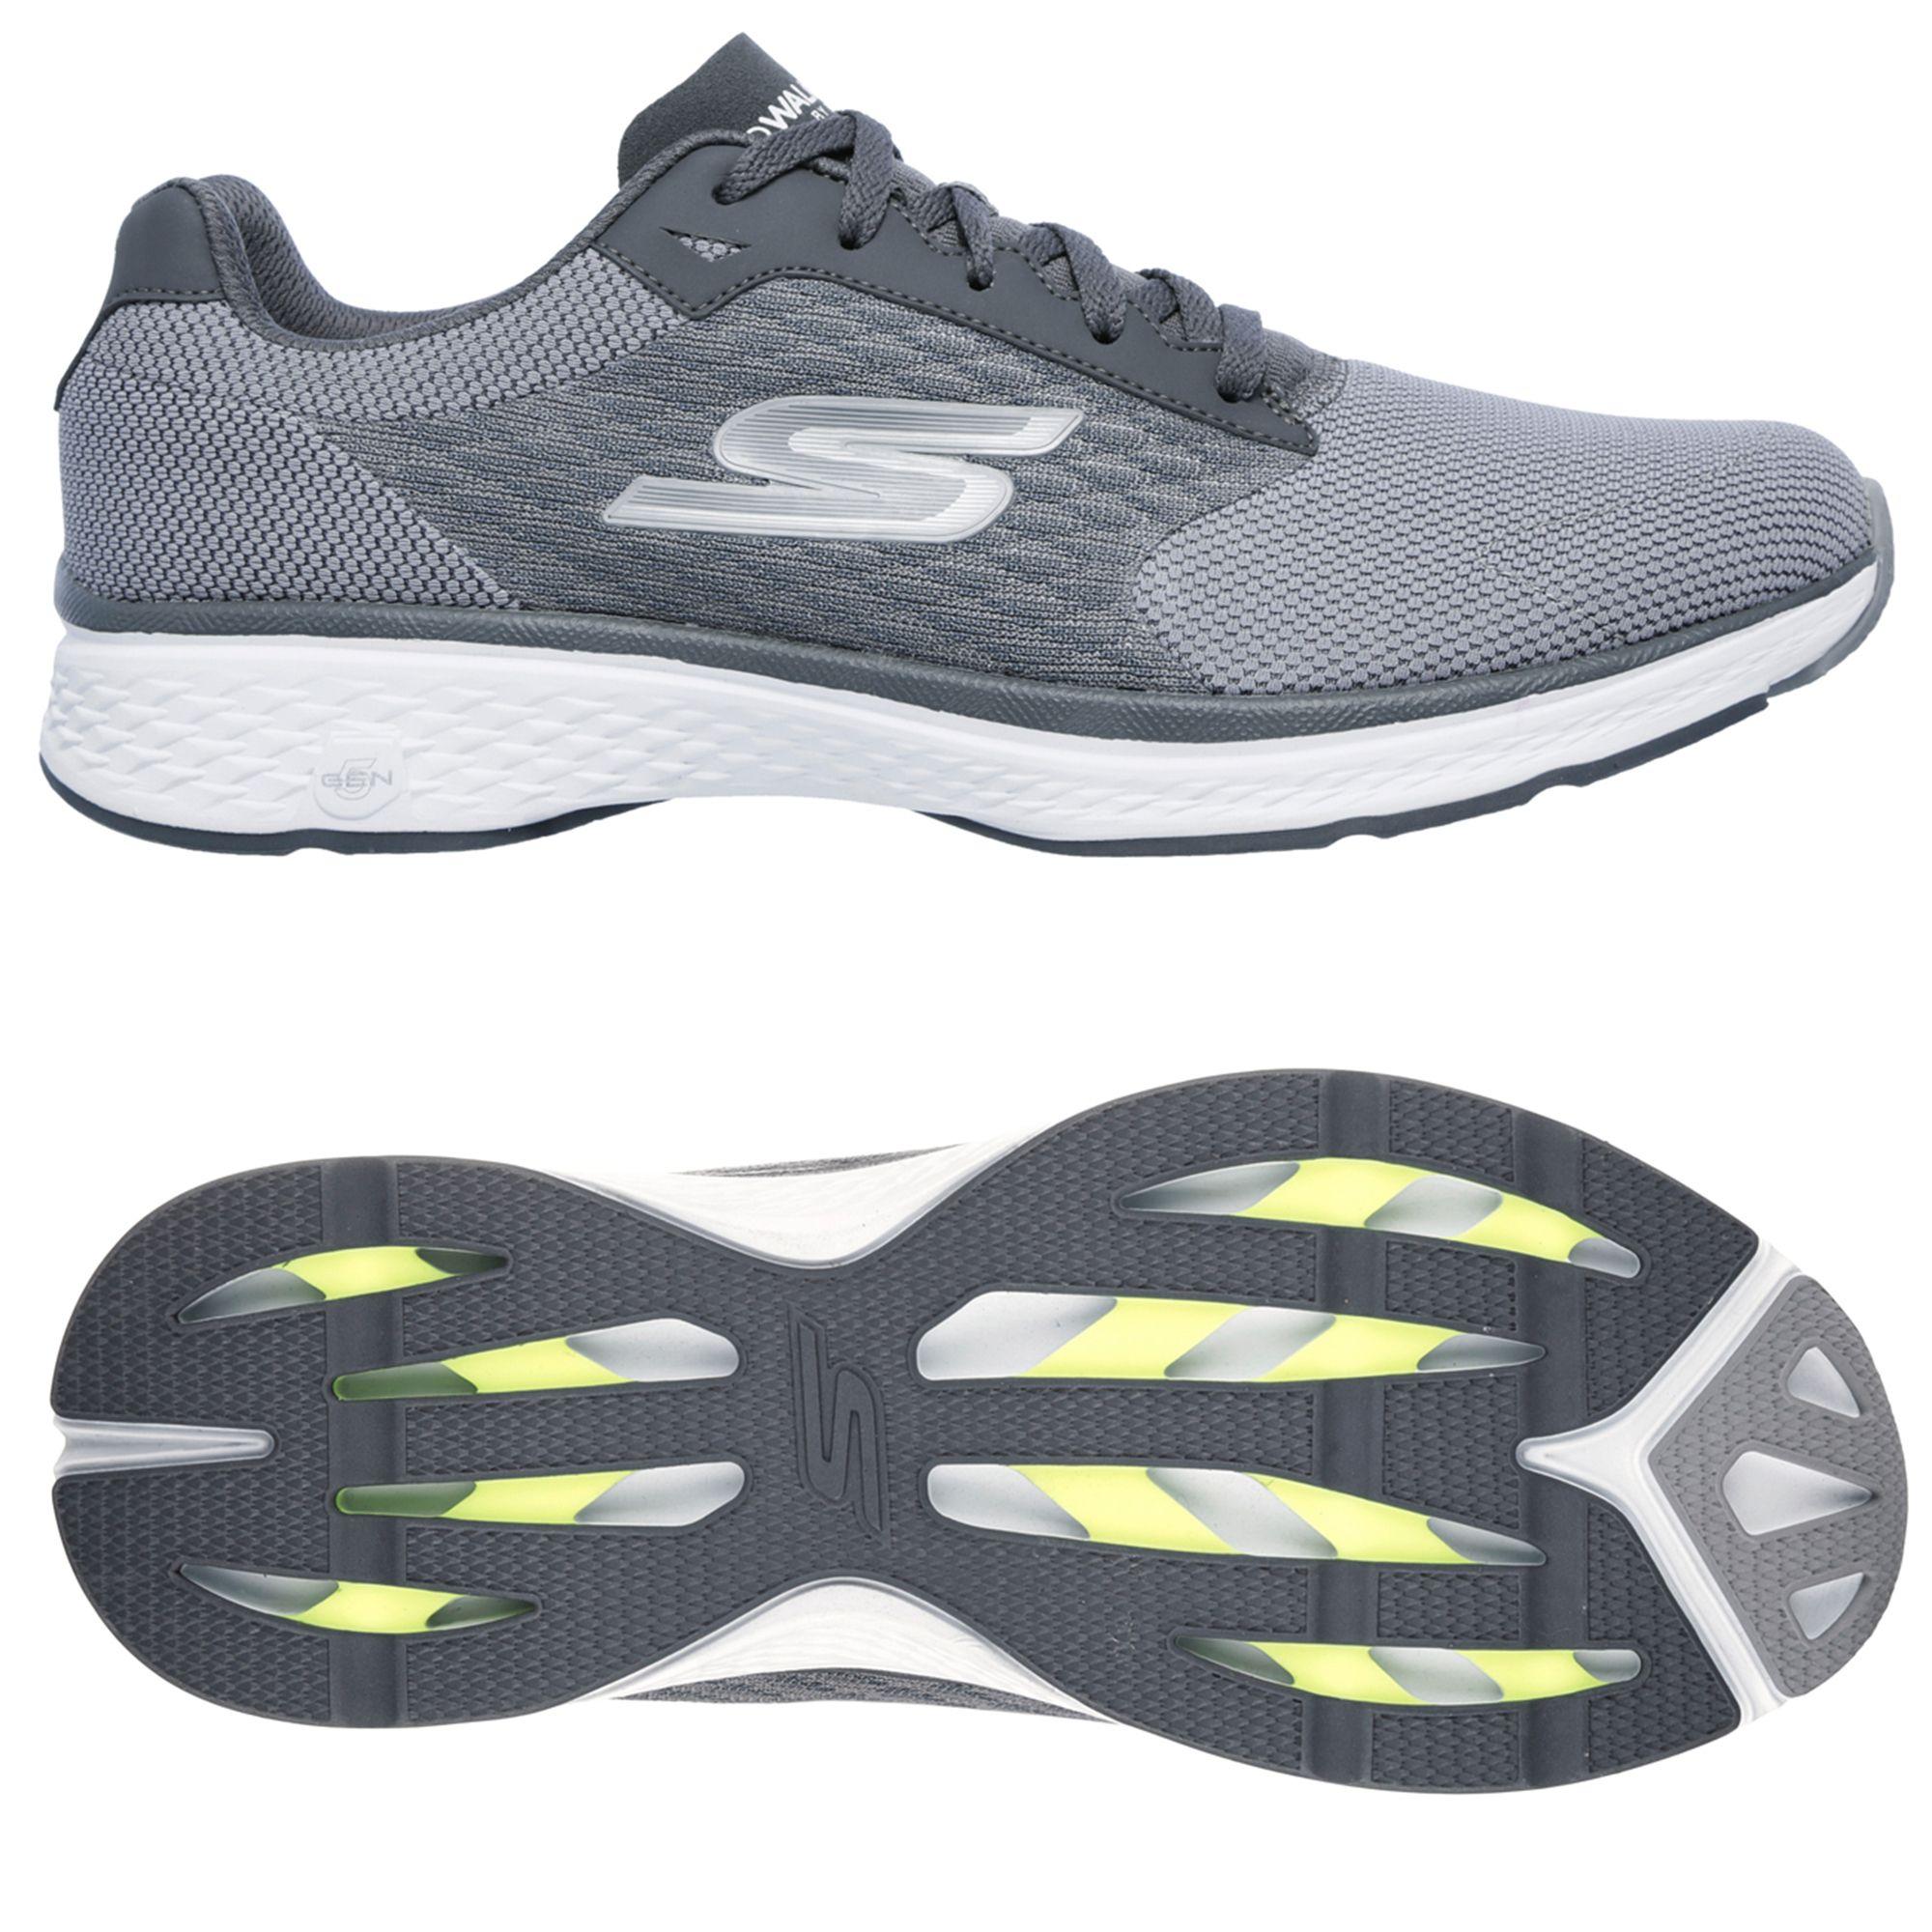 skechers go walk sport lace up mens walking shoes